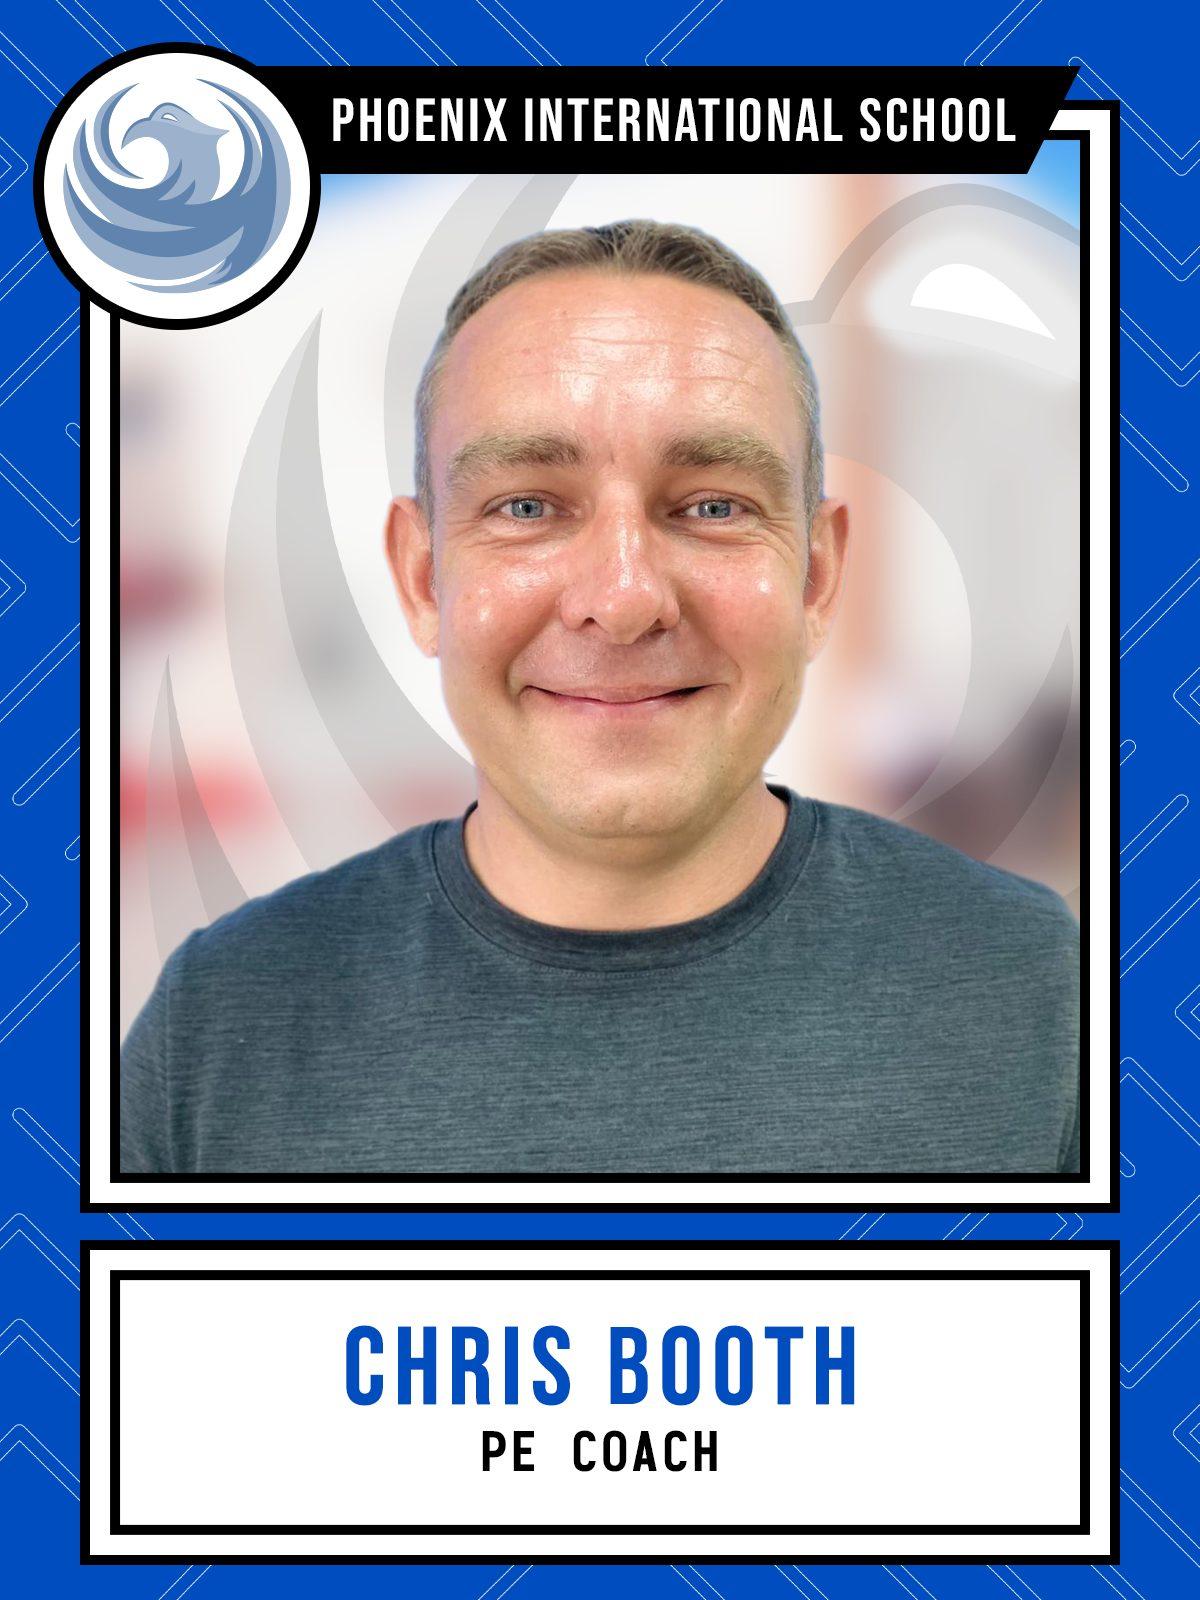 Chris Booth - PE Coach